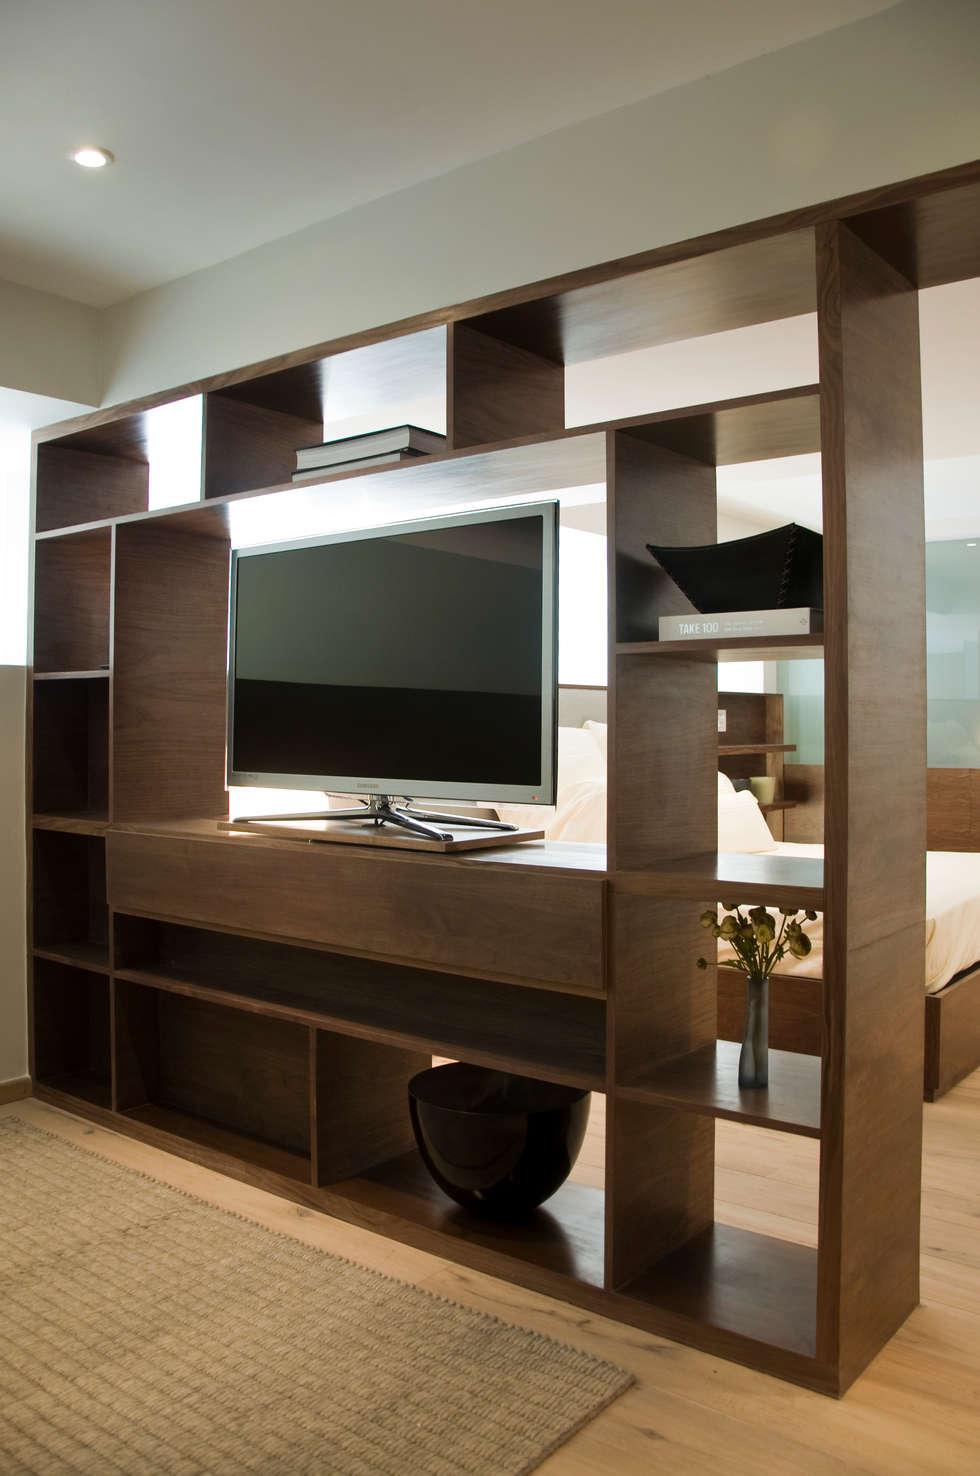 Loft2 De Basch Arquitectos Homify # Muebles Divisorios